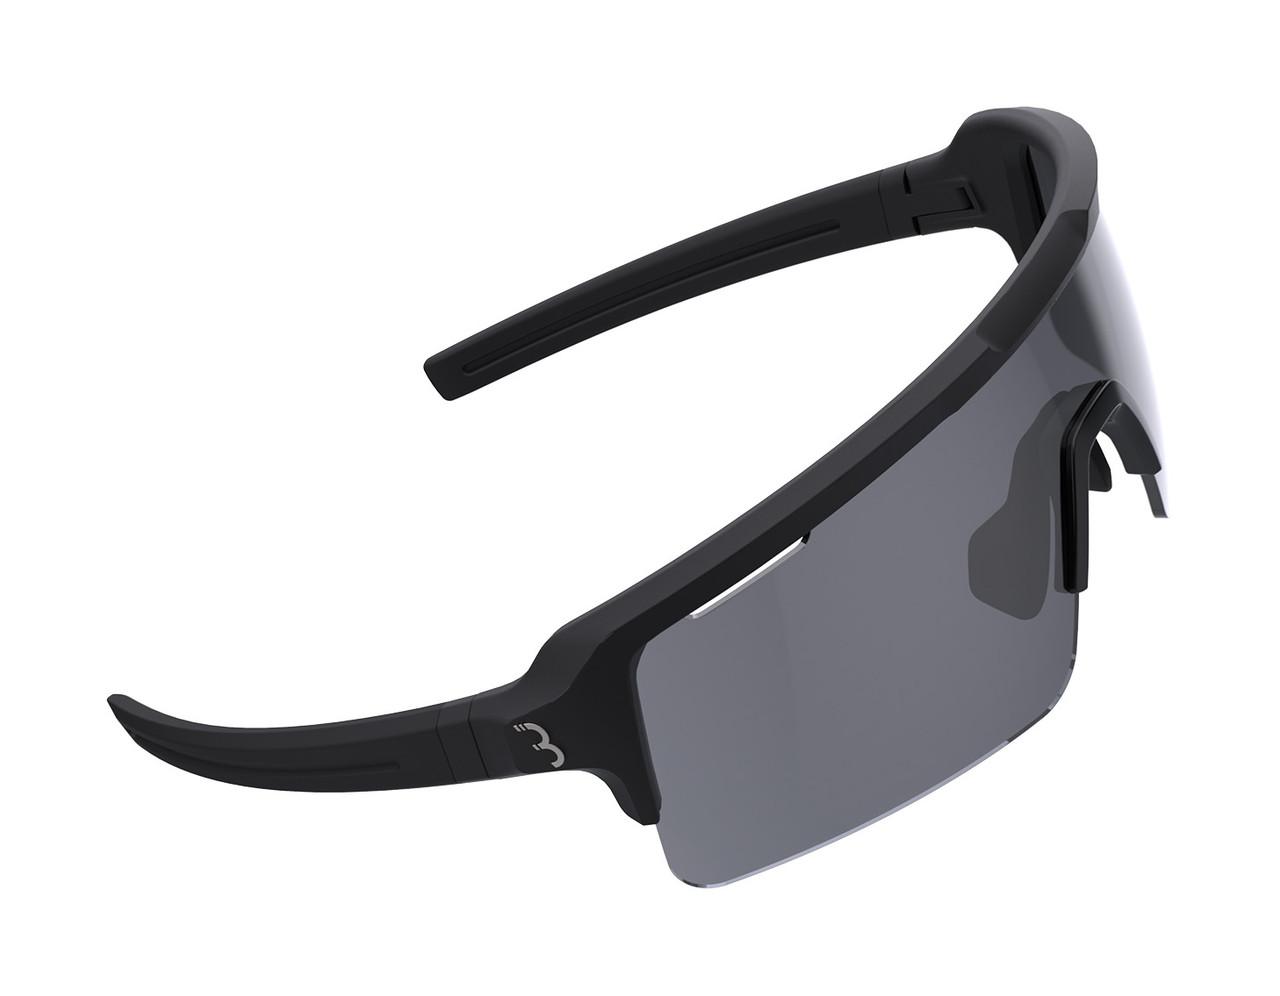 BBB Fuse Sport BSG-65 Sunglasses Matte Black / Smoke Lens RRP £64.99